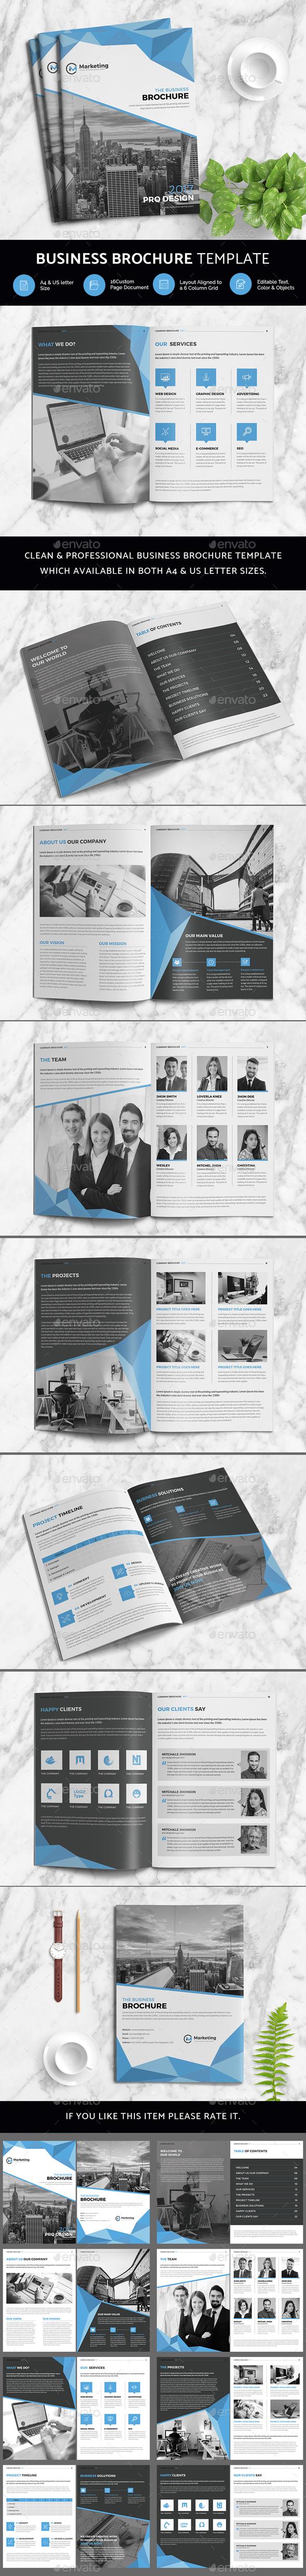 Business Brochure - Print Templates